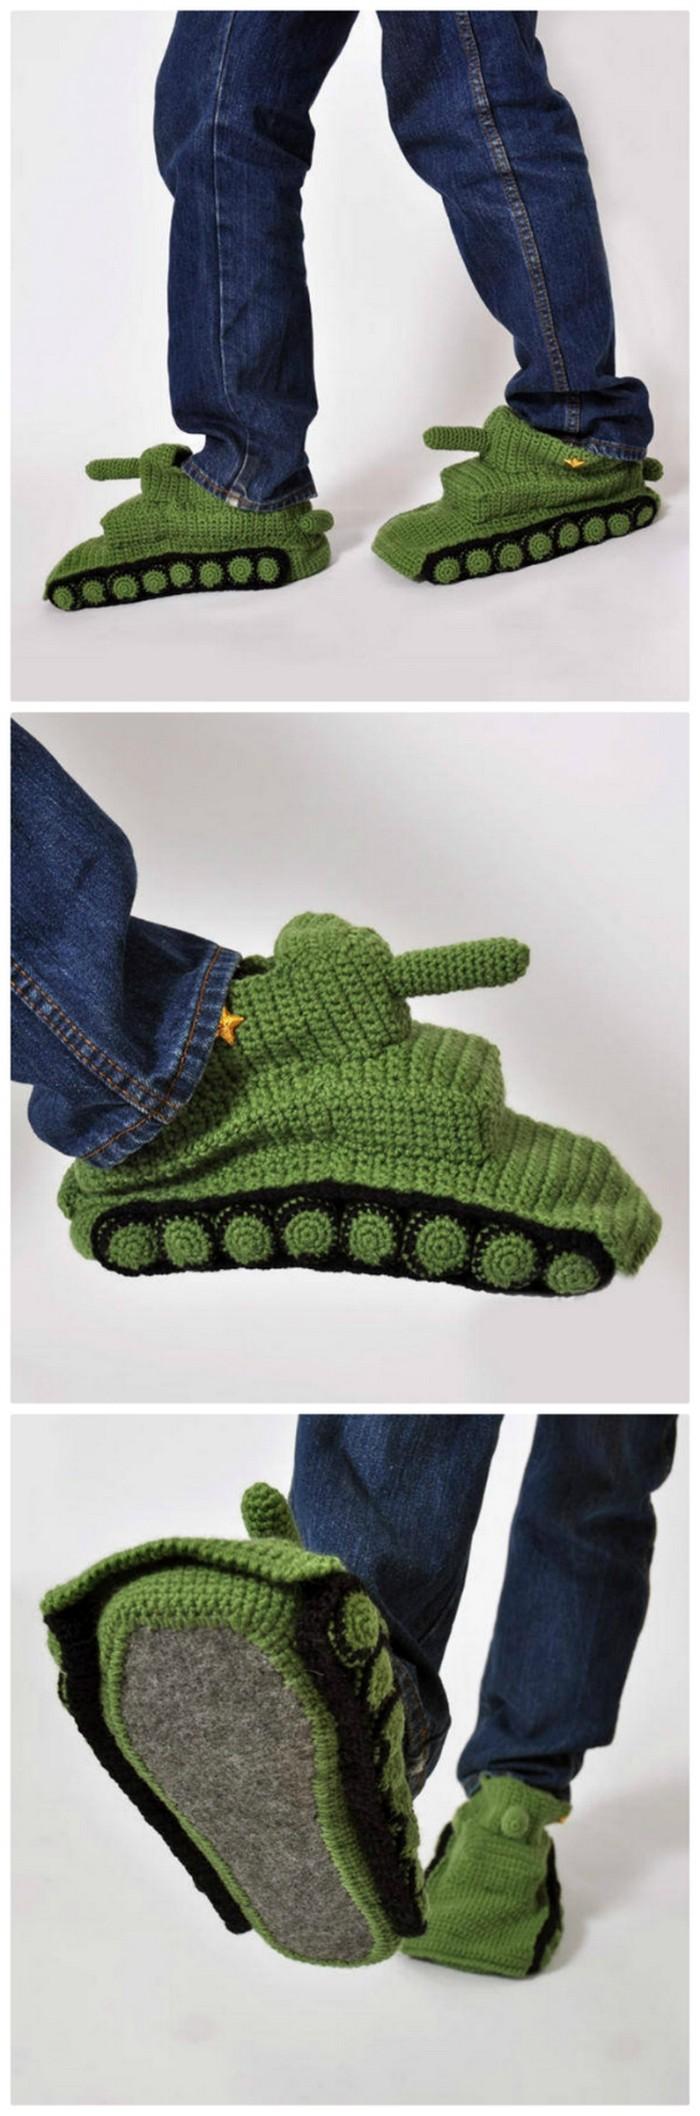 Army Tank Shoes Crochet Free Pattern